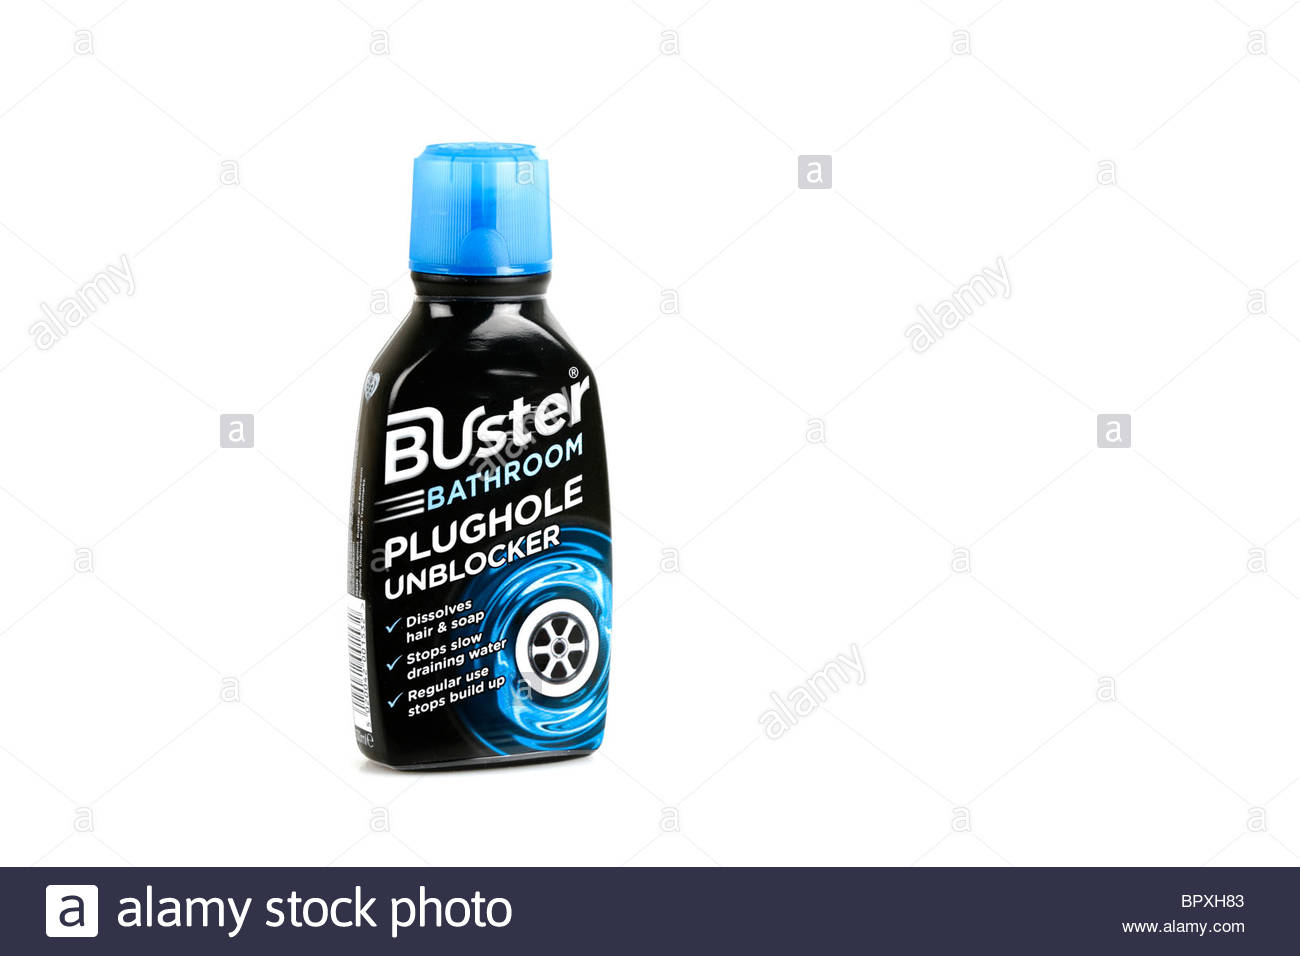 Plughole unblocker cleaning fluid - Stock Image